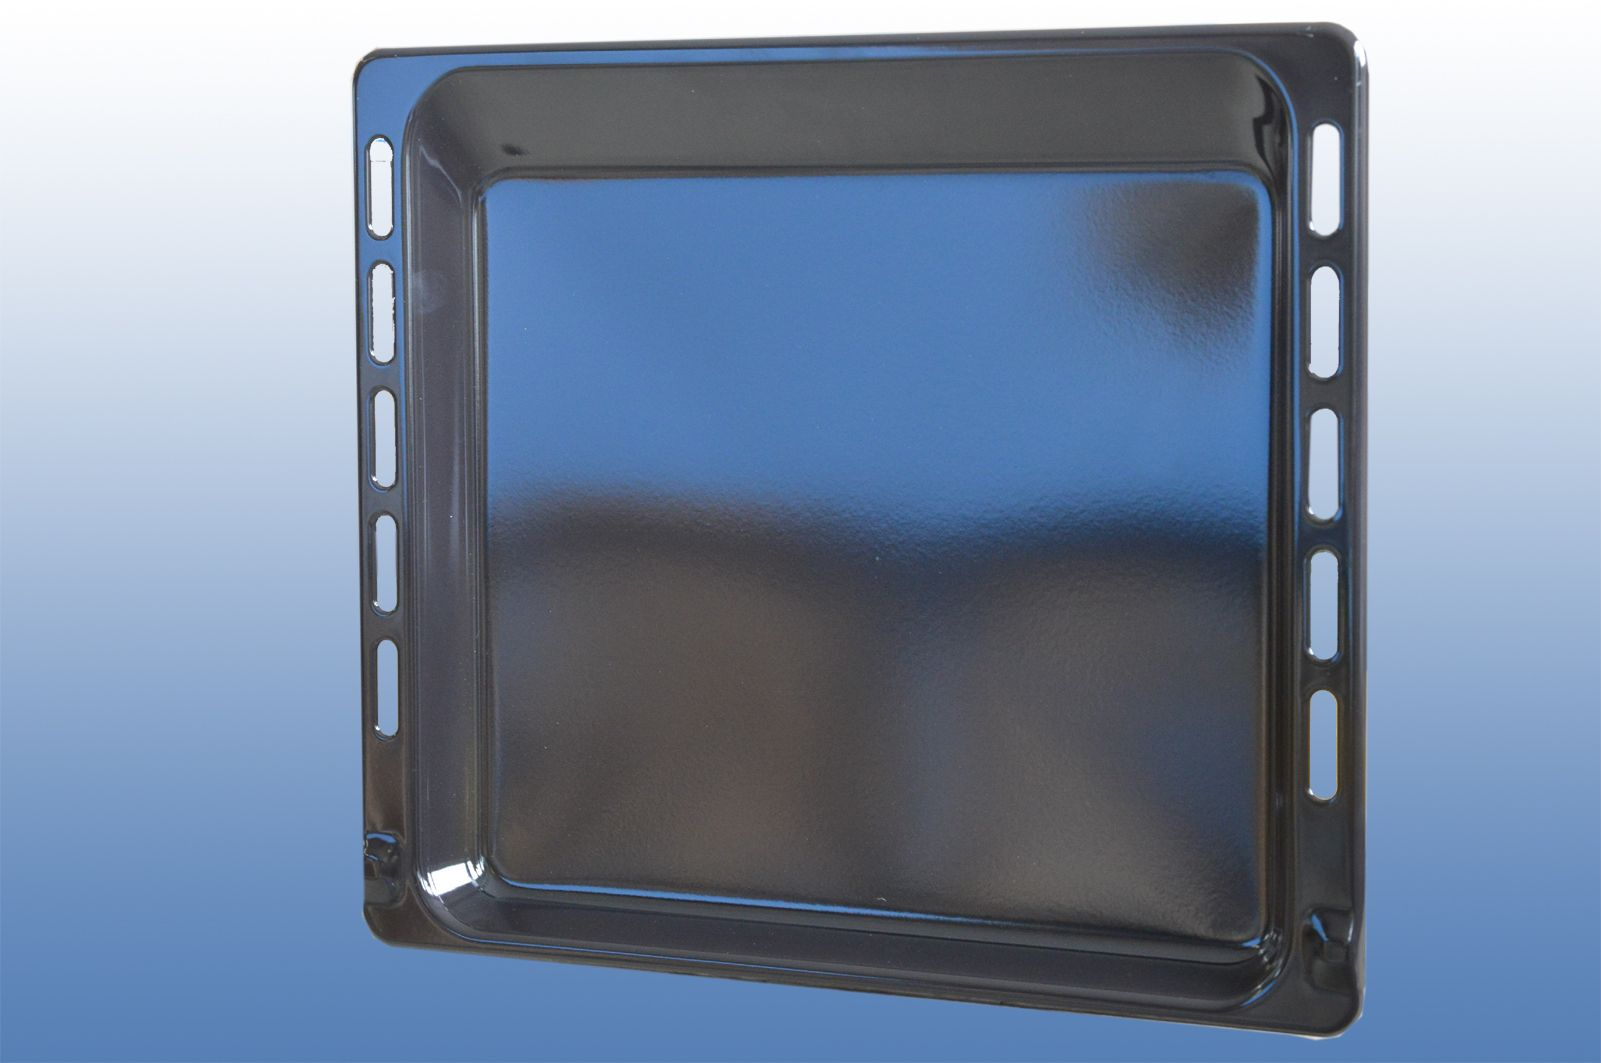 fettpfanne bauknecht whirlpool ikea ignis emailliert. Black Bedroom Furniture Sets. Home Design Ideas